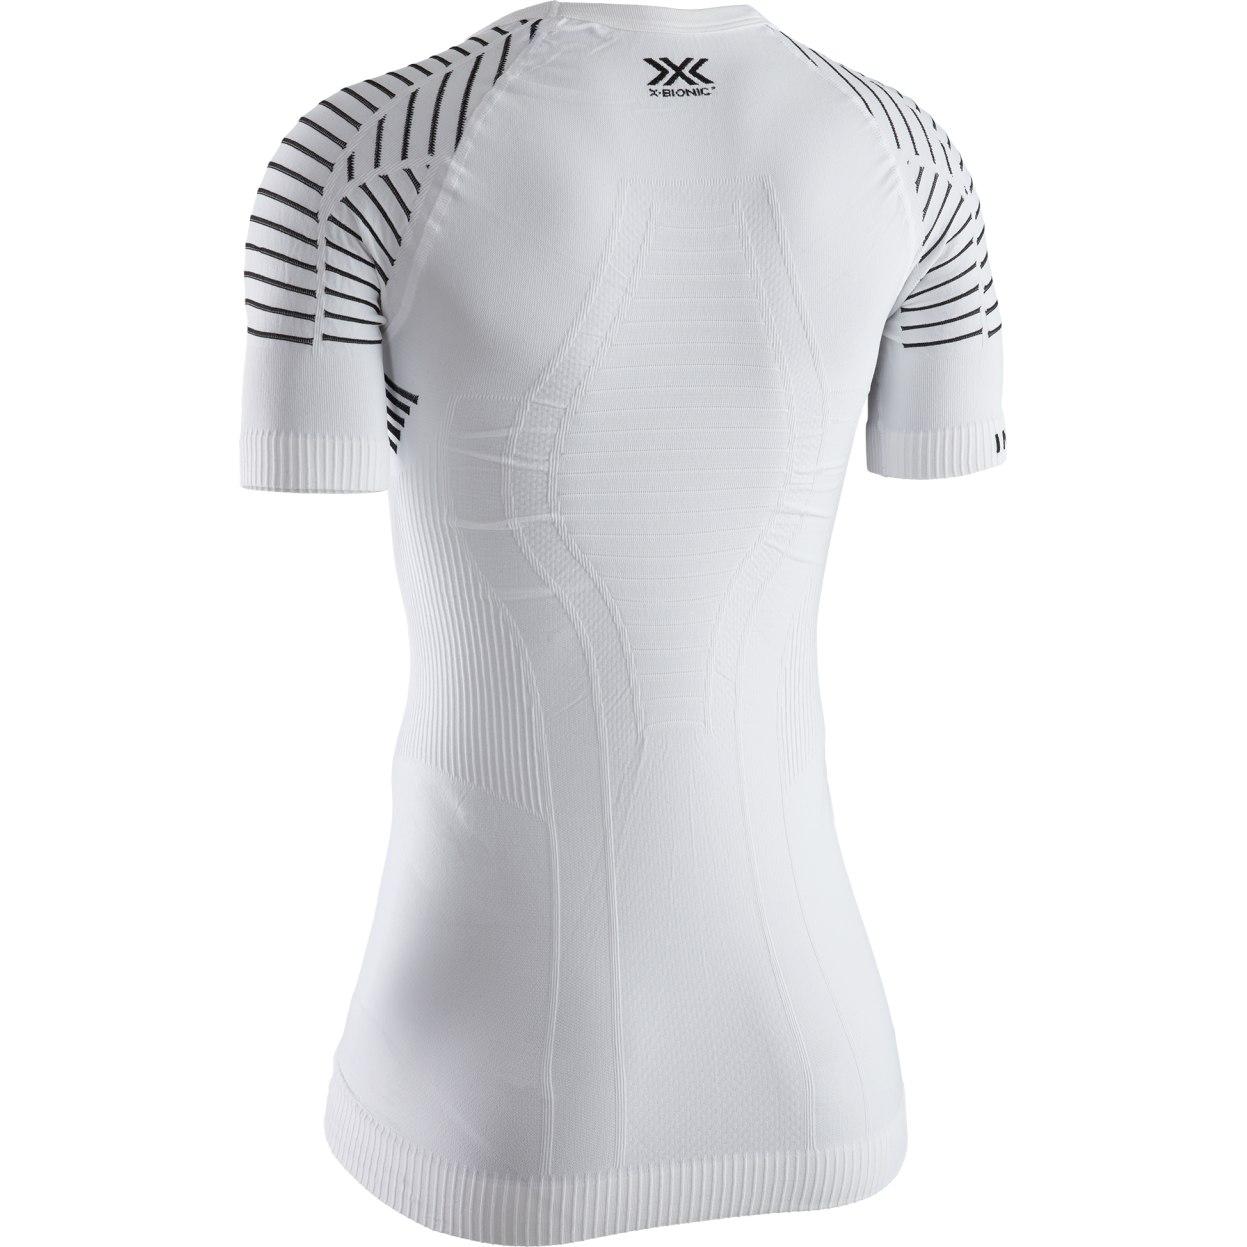 Image of X-Bionic Invent 4.0 LT Shirt Round Neck Short Sleeves Shirt for Women - arctic white/dolomite grey